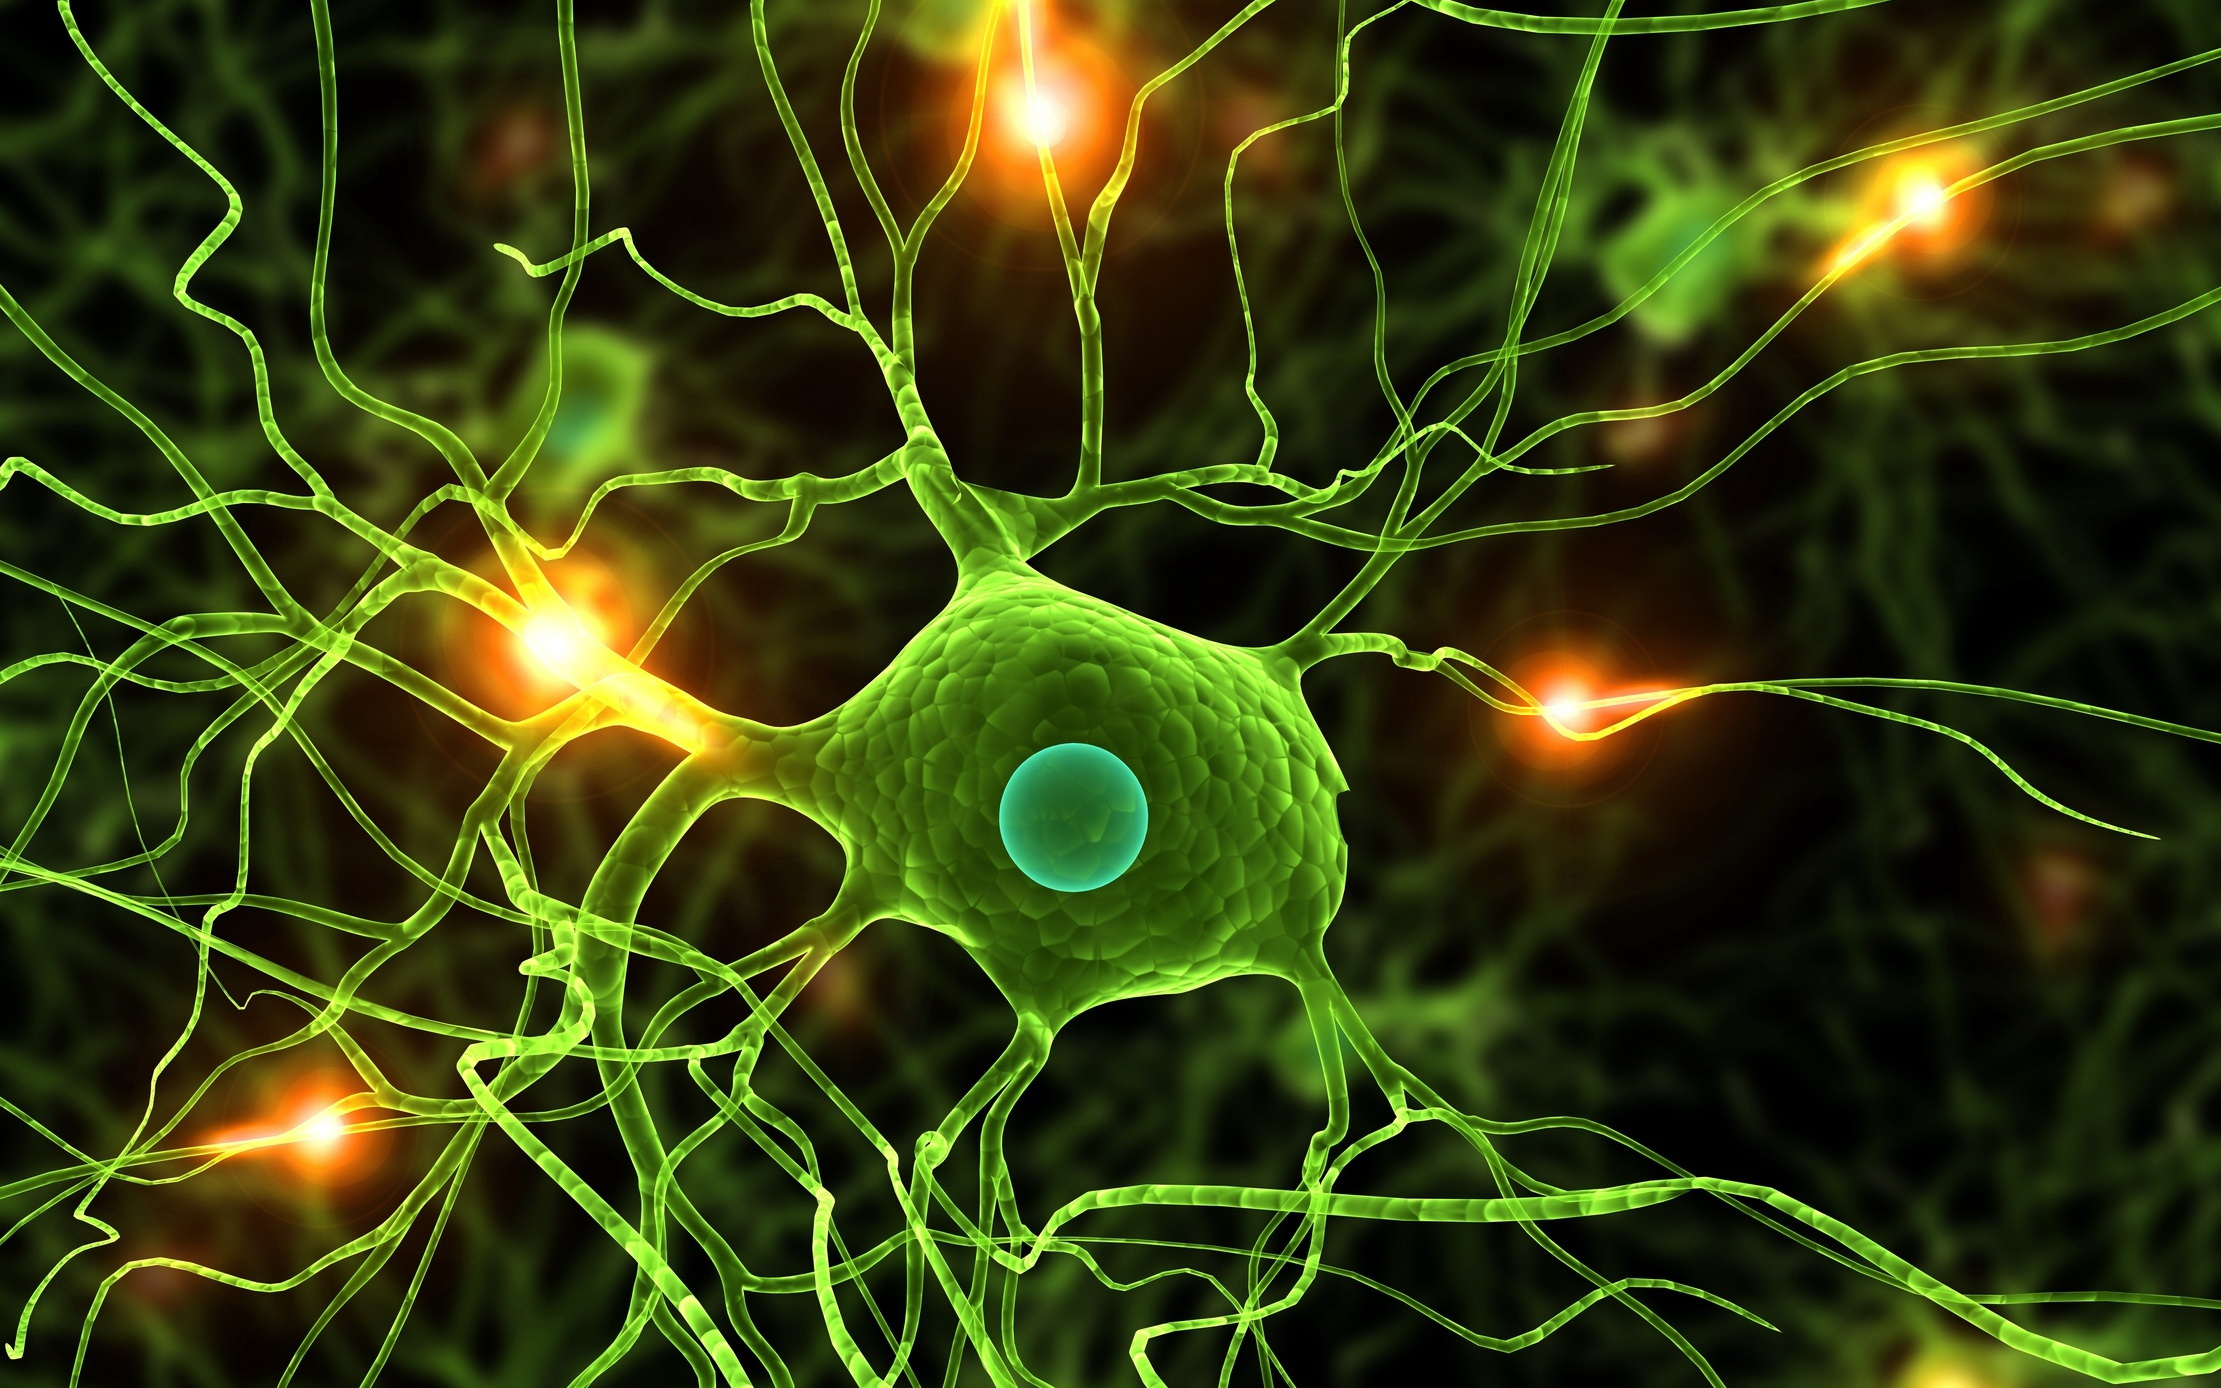 Spine - Anatomy and Neuroscience Photo